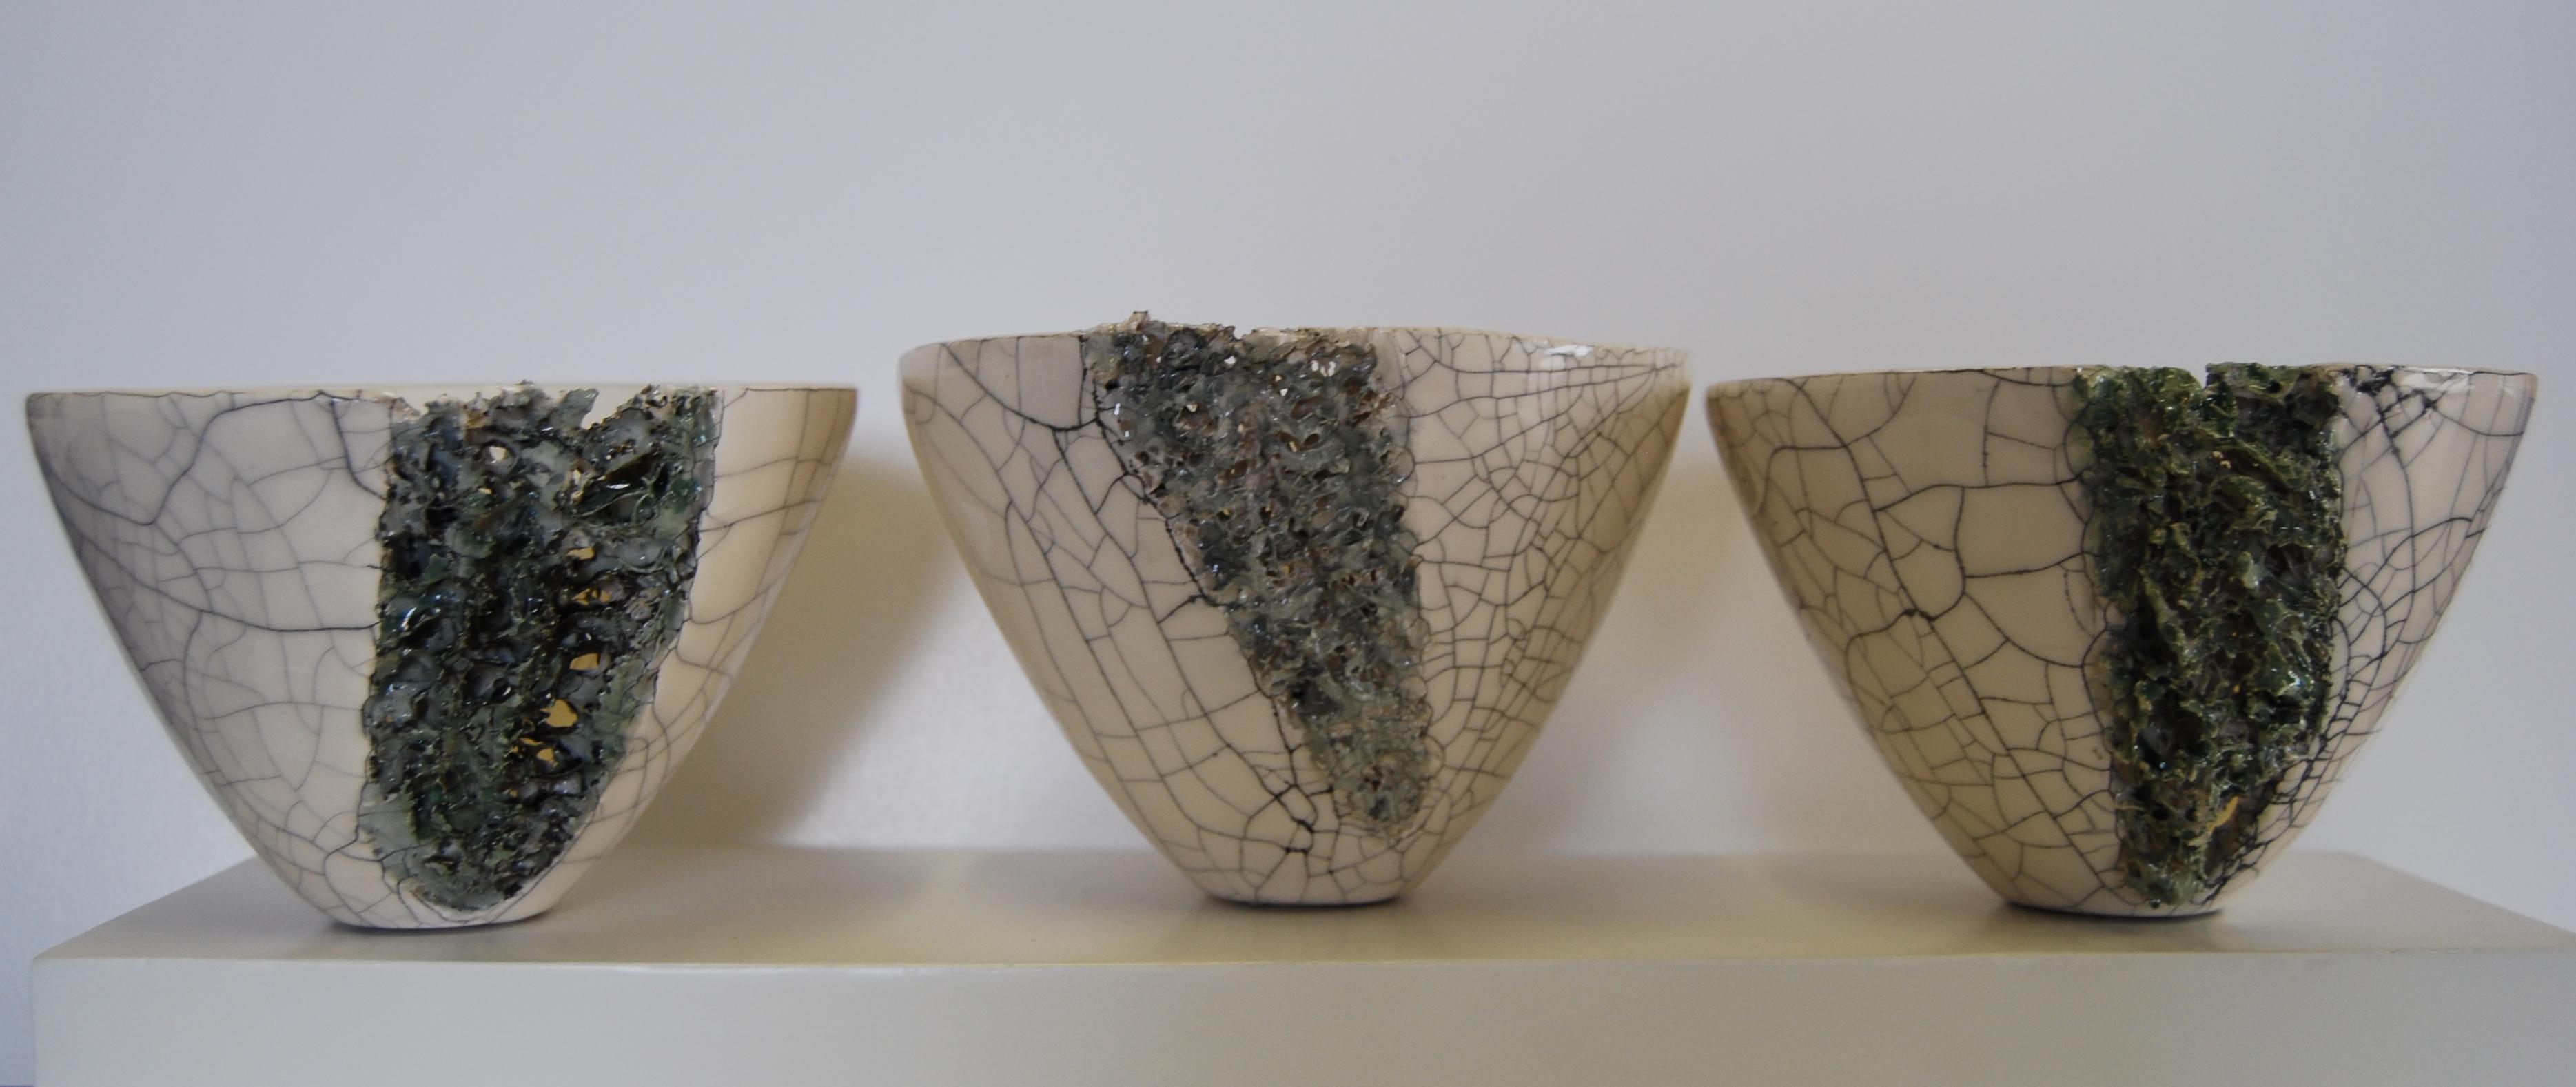 Ceramics by Annie Flitcroft